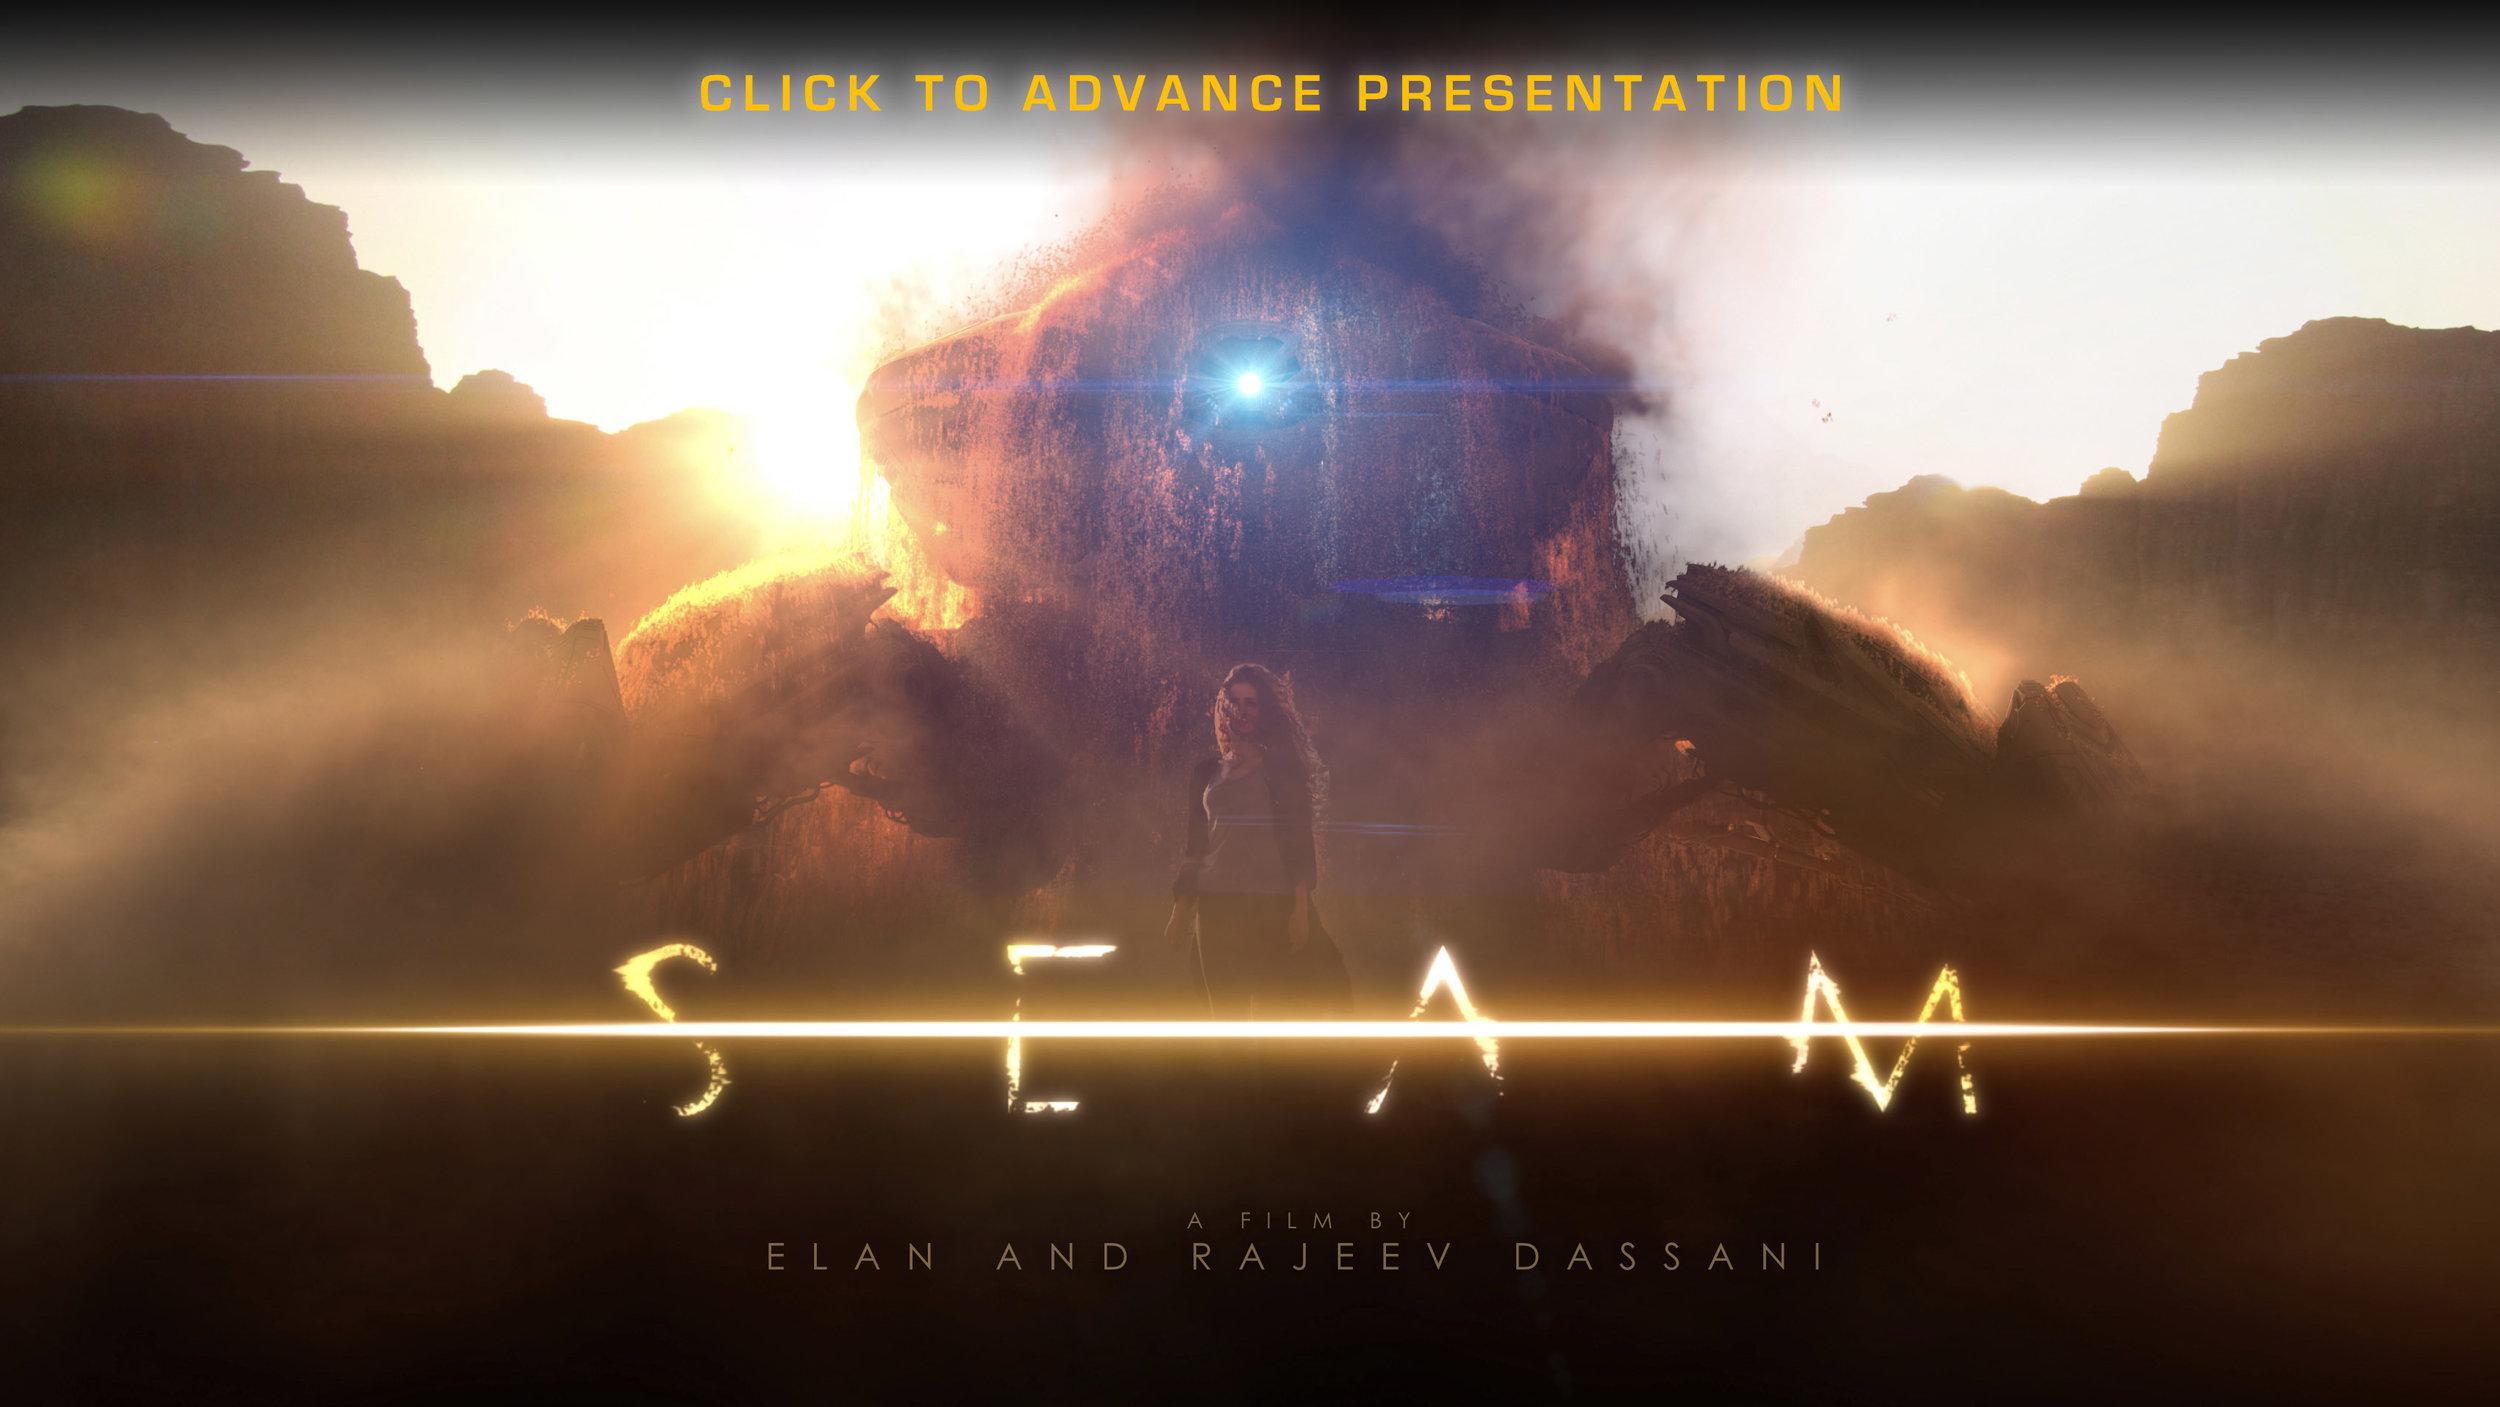 SEAM_pitch_2017-08-09_v03_Elan.001a.jpg